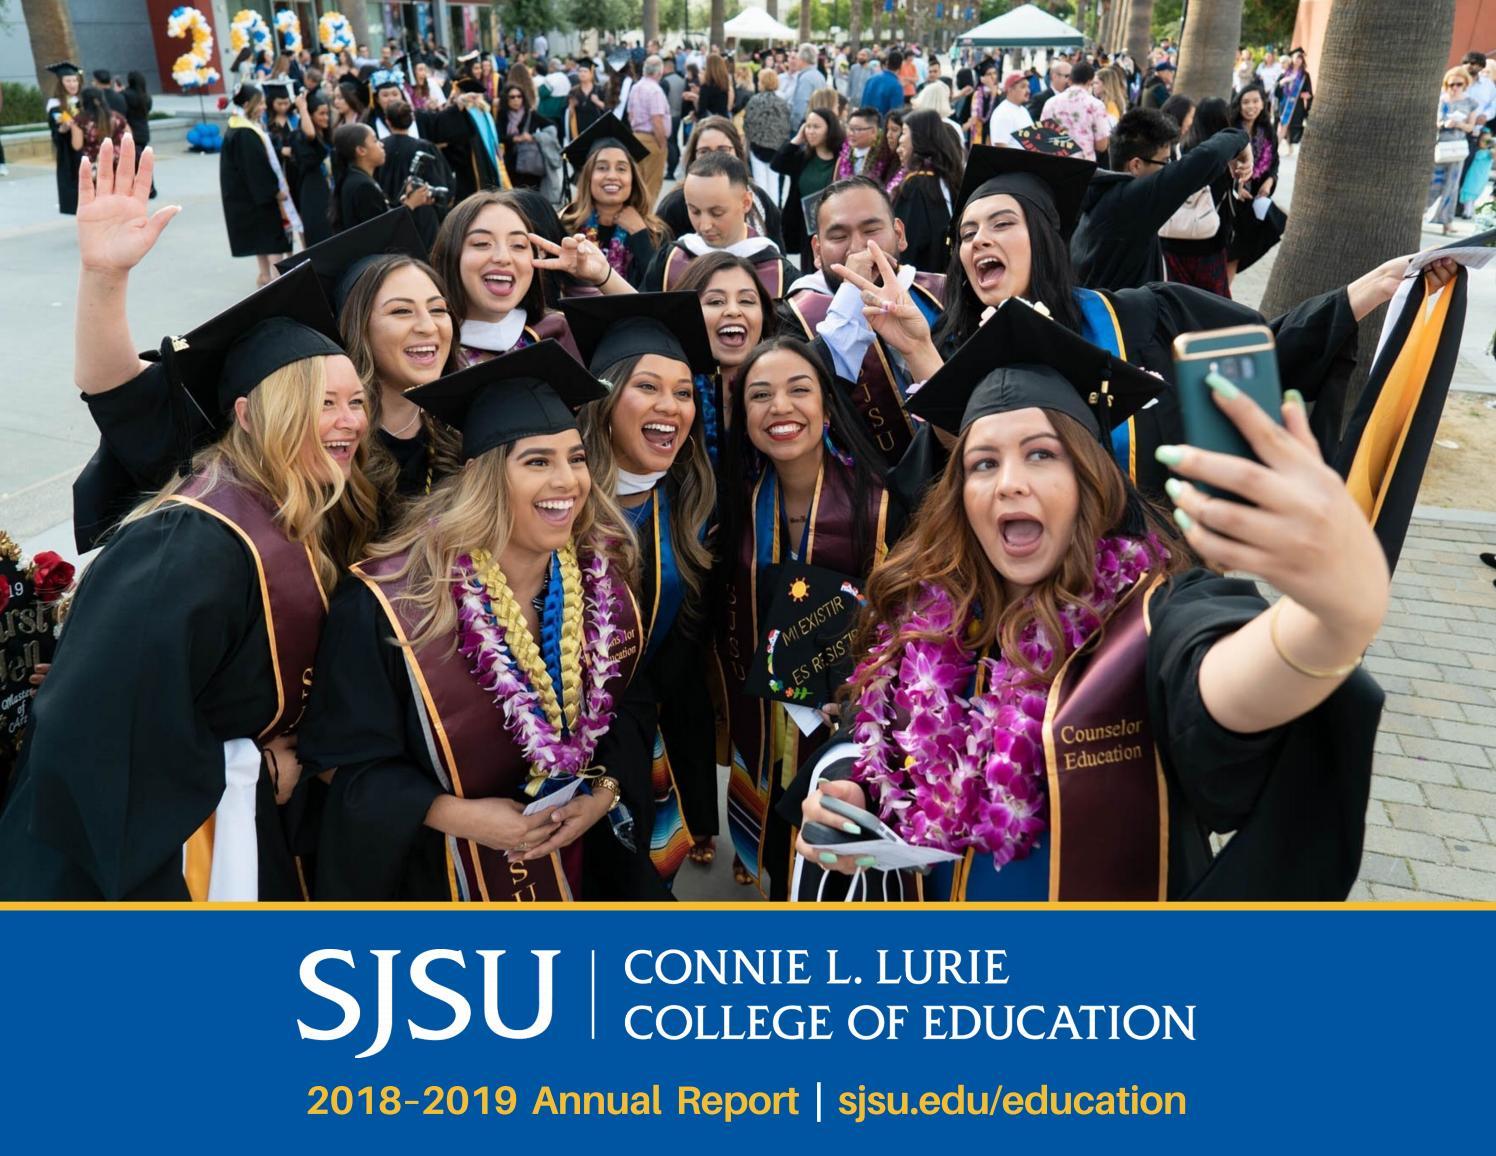 Sjsu Summer 2020.Sjsu Lurie College Of Education 2018 2019 Annual Report By